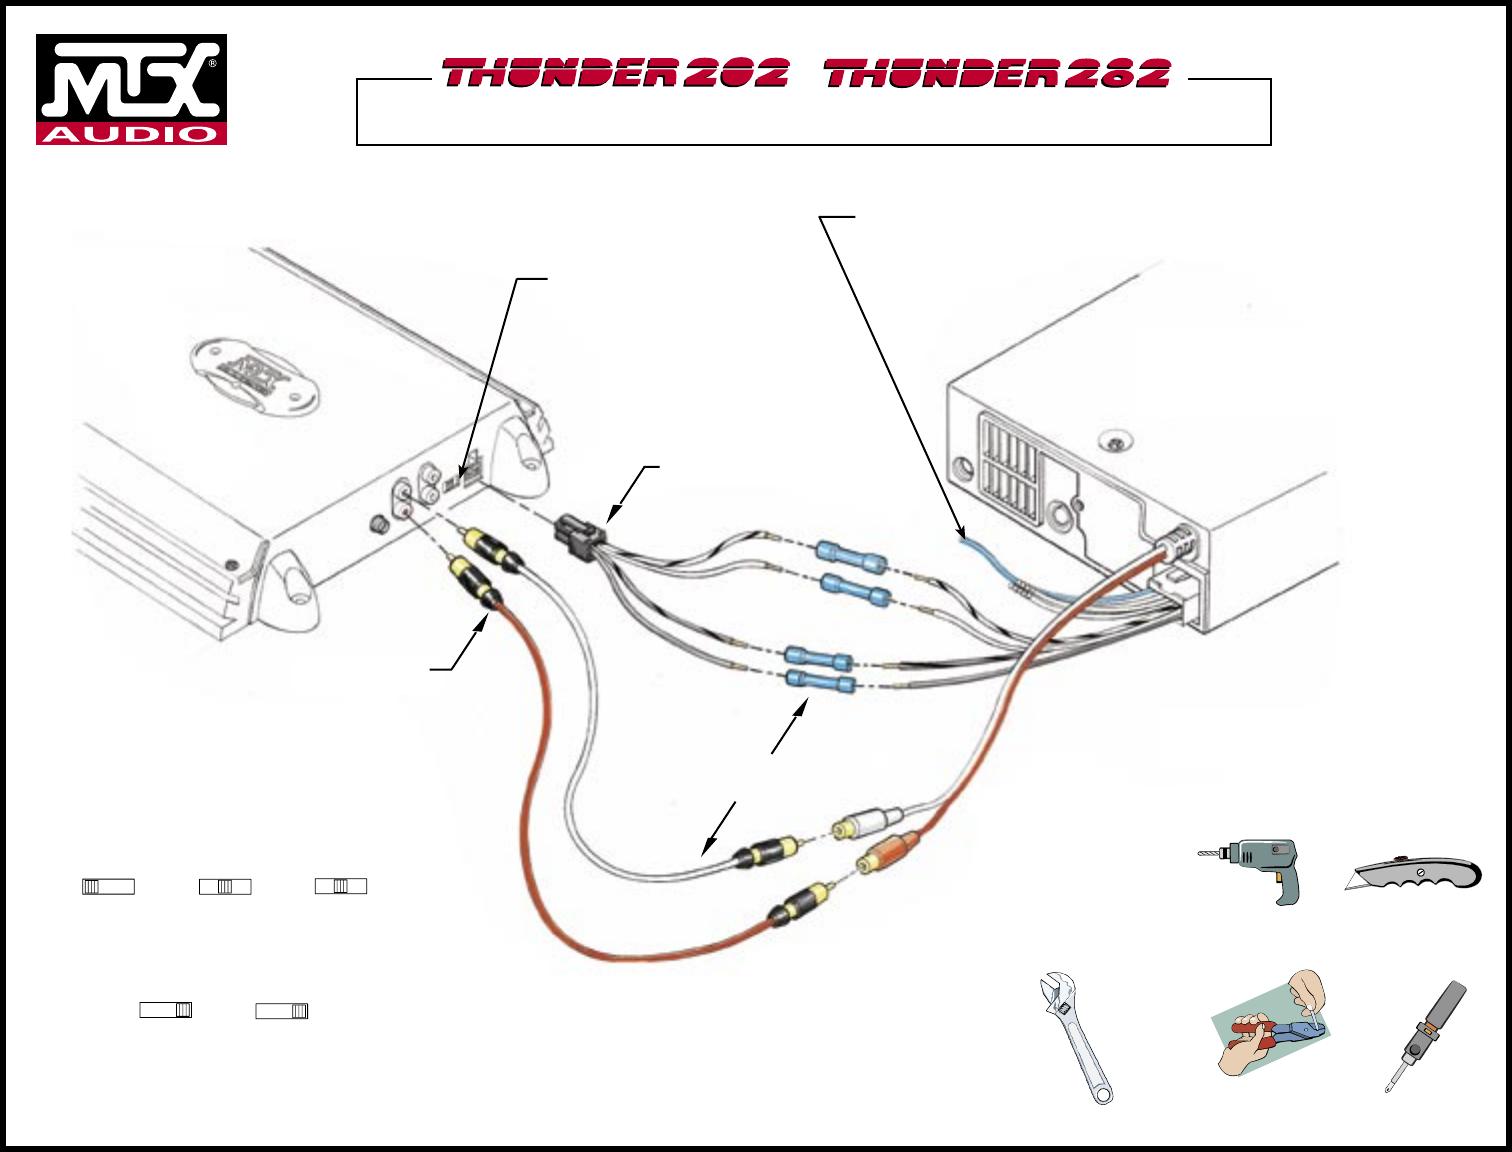 Polaris Mtx Powered Subwoofer Wiring Diagram